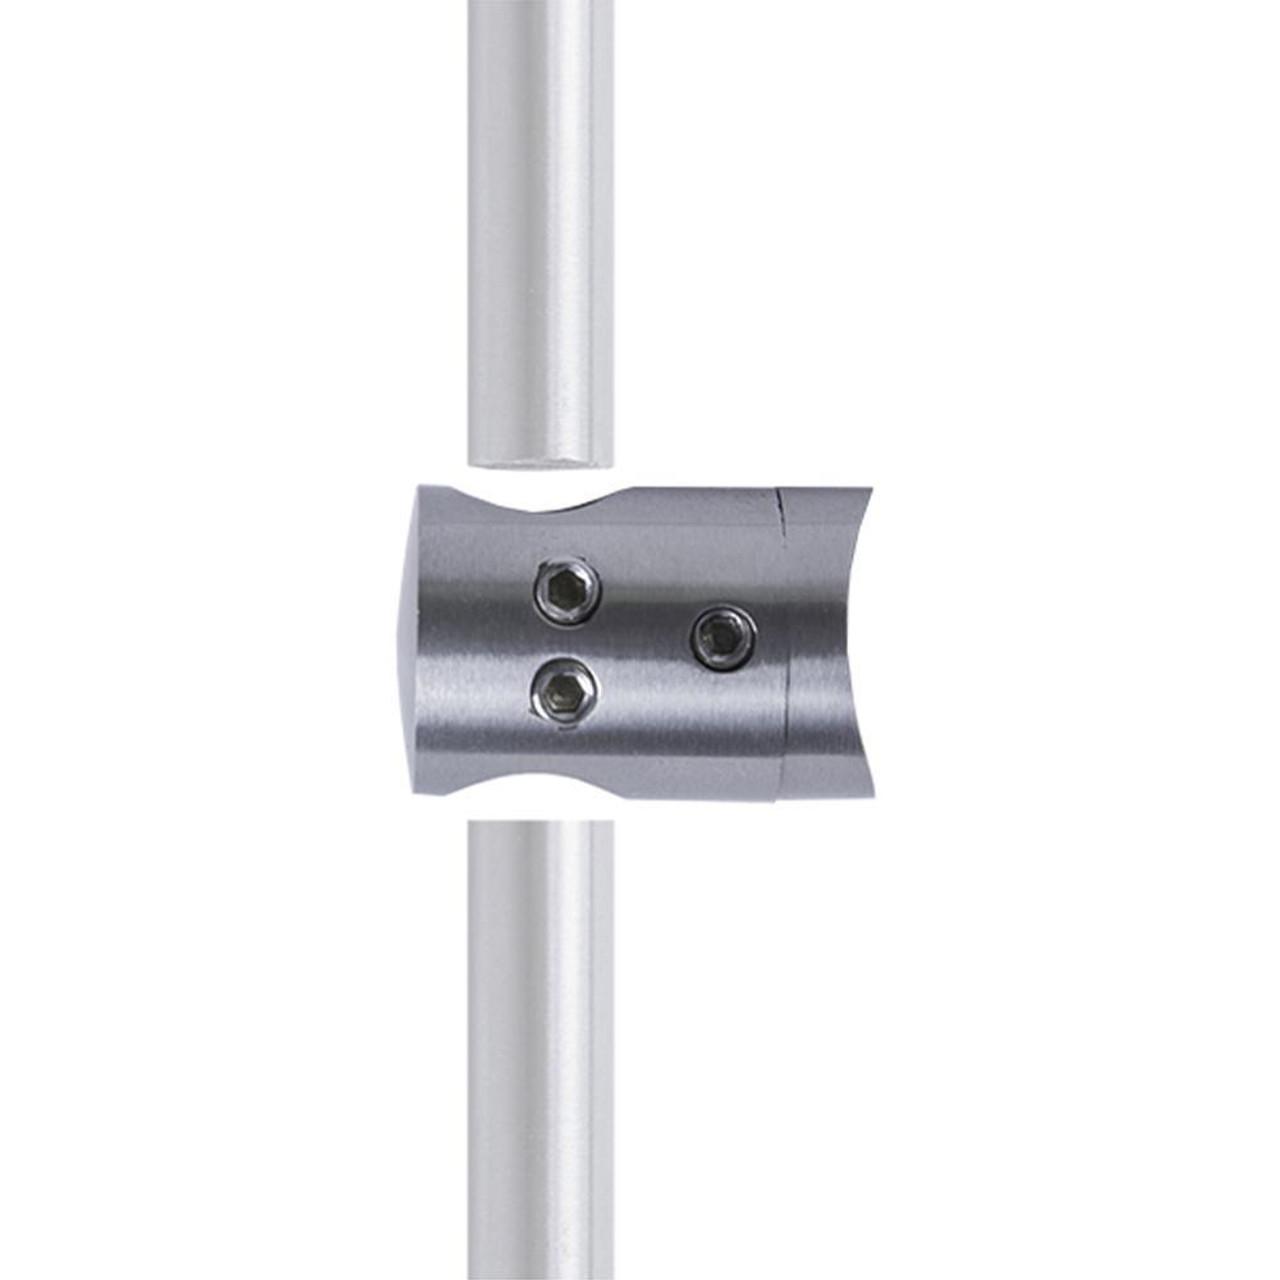 12 mm Round Bar Infill Holder – Connector – Fits 42.4 mm newel (AX10.010.206.A.SP)